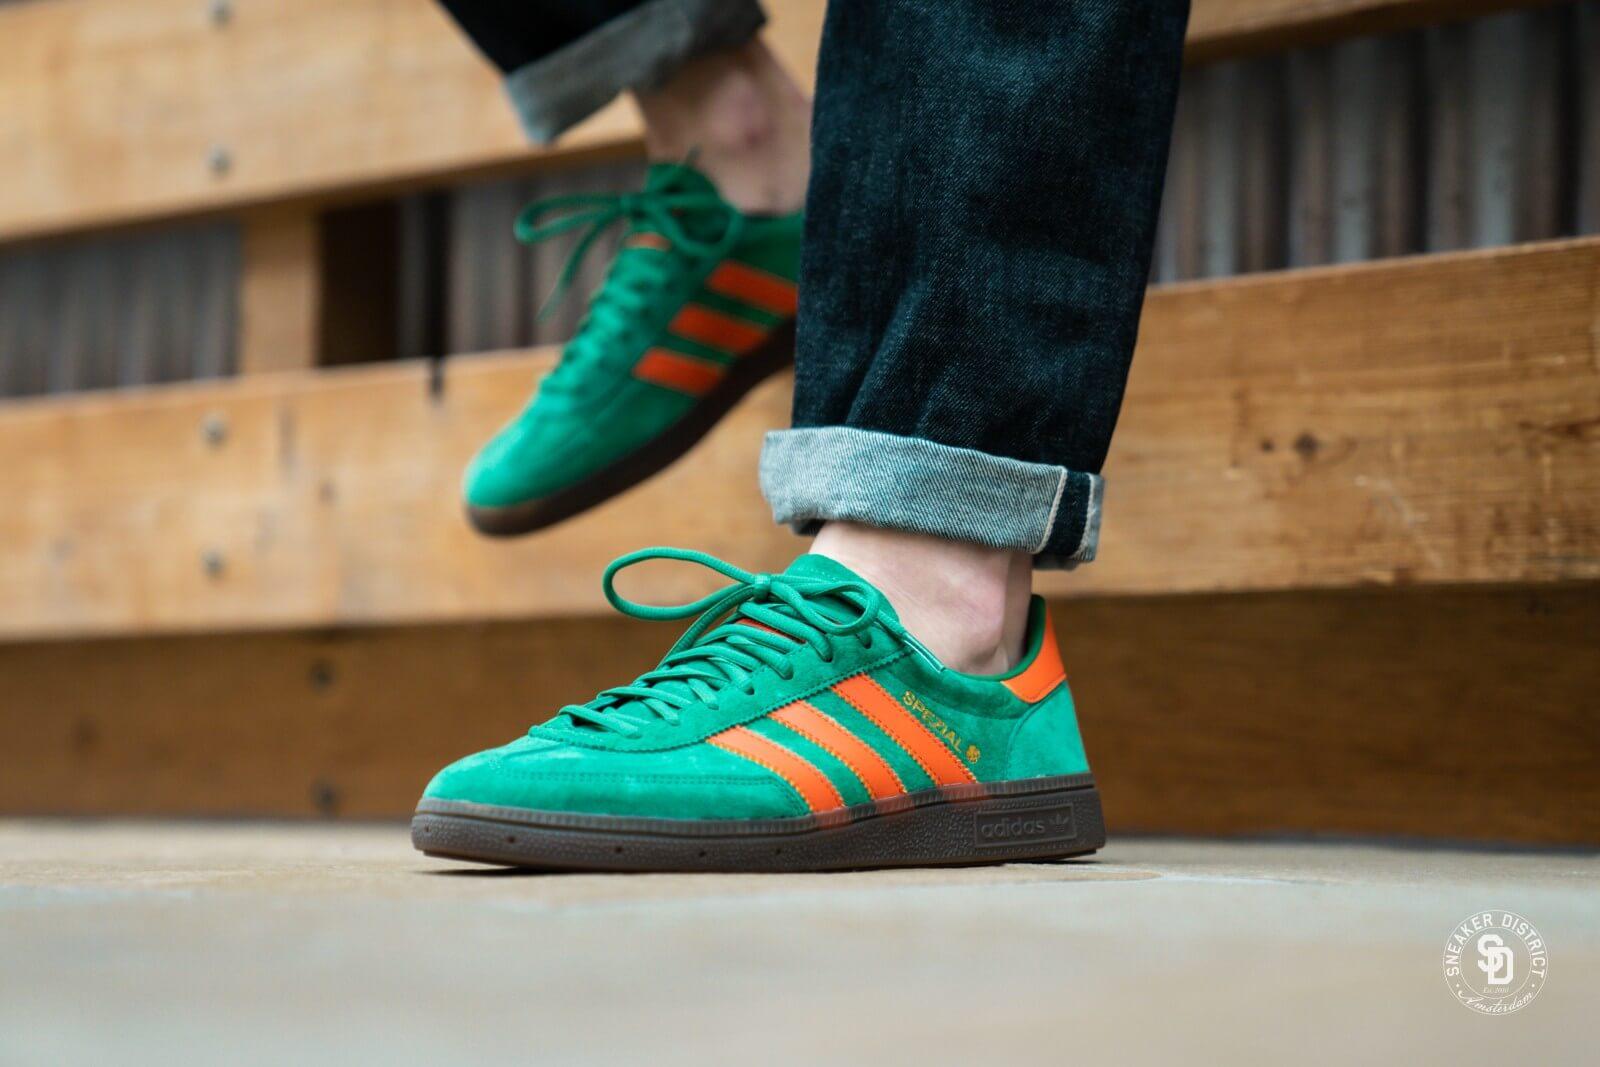 Adidas Handball Spezial Bold Green/Raw